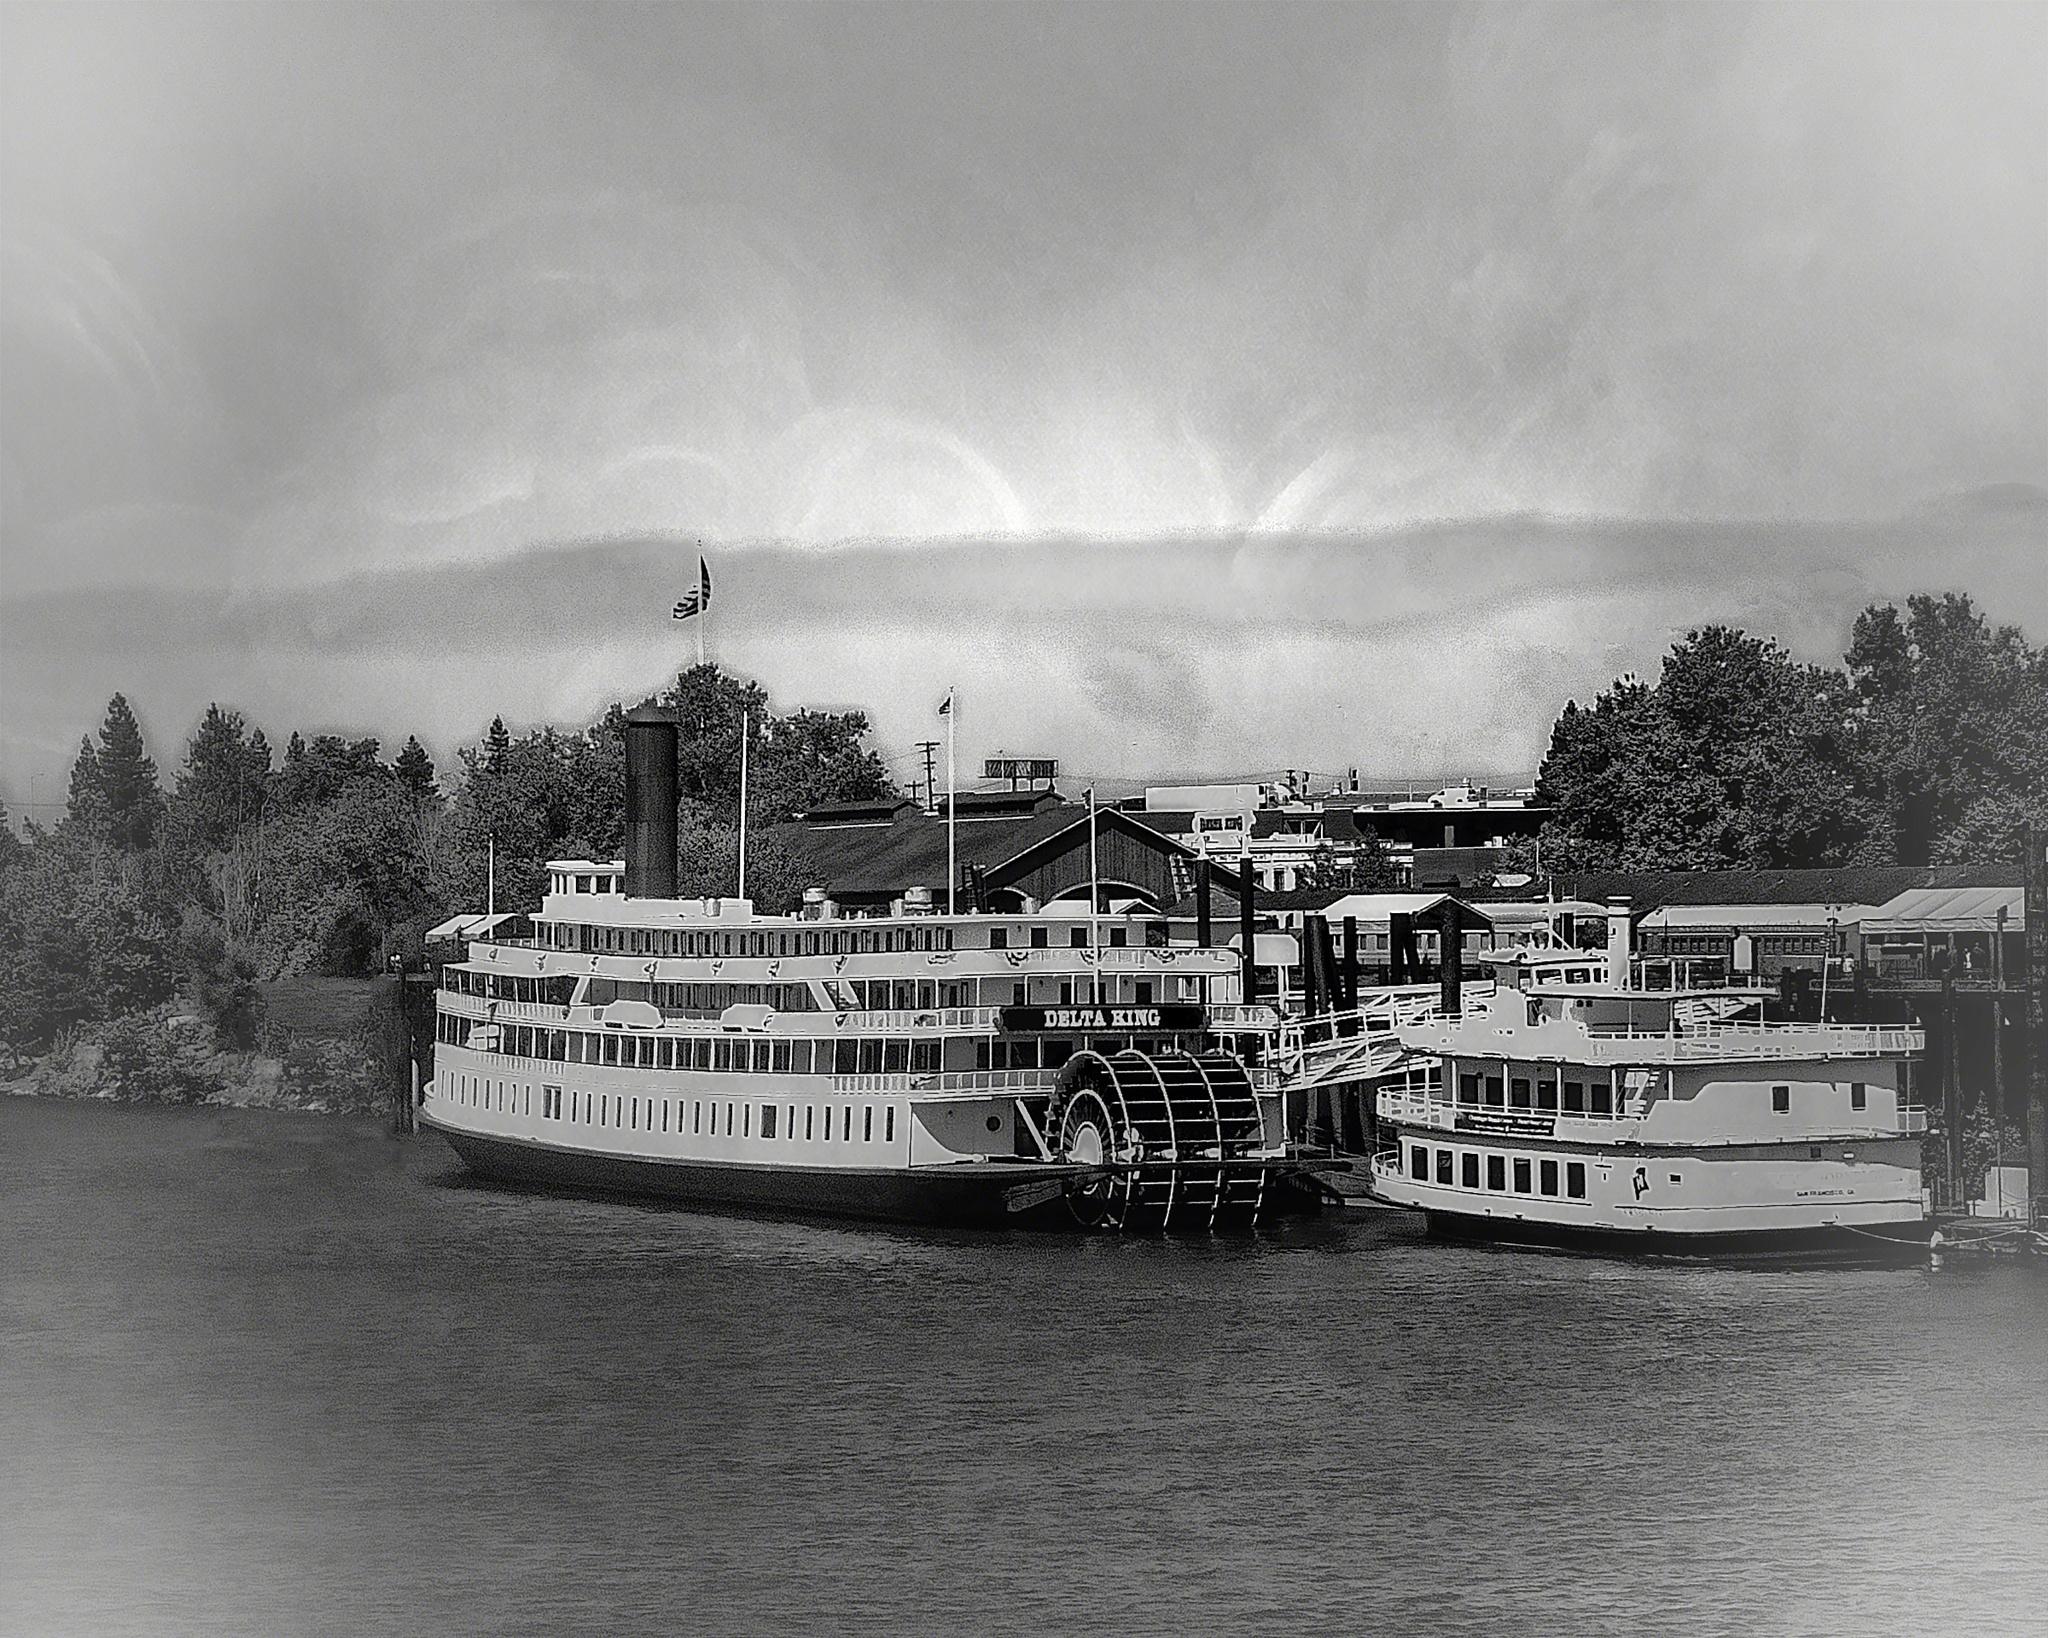 Delta King River Boat by Bill Havle